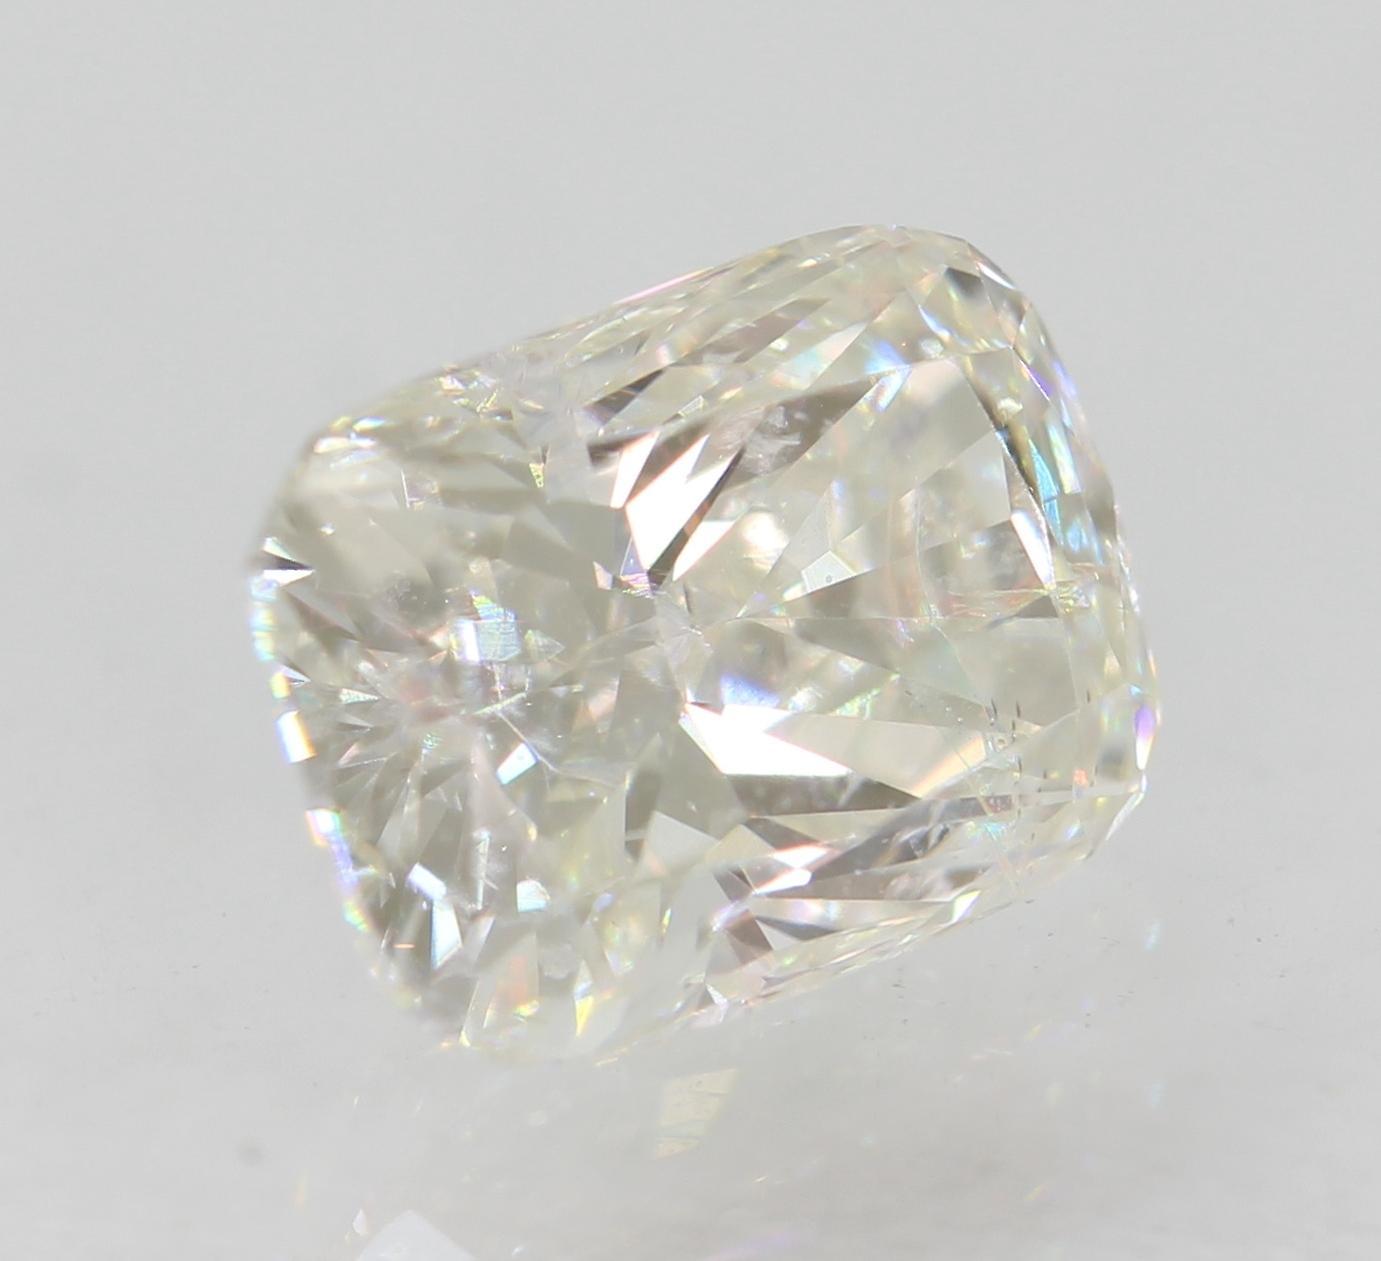 Certified 0.74 Carat F VS1 Cushion Enhanced Natural Loose Diamond 5.99x4.49mm